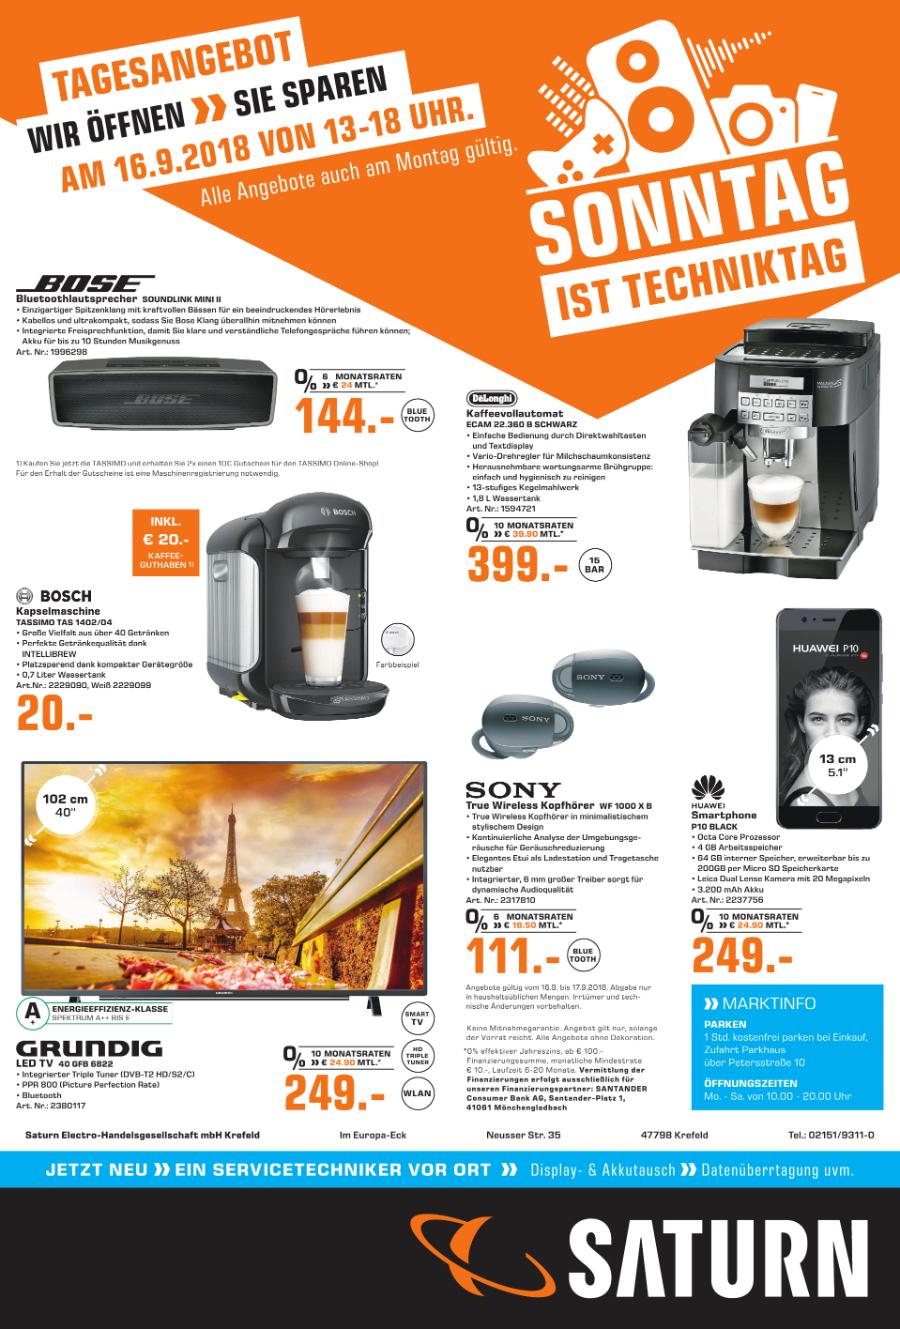 [Lokal Saturn Krefeld] Verkaufsoffener Sonntag: Bose SoundLink Mini II,Tassimo quasi umsonst, u.a.